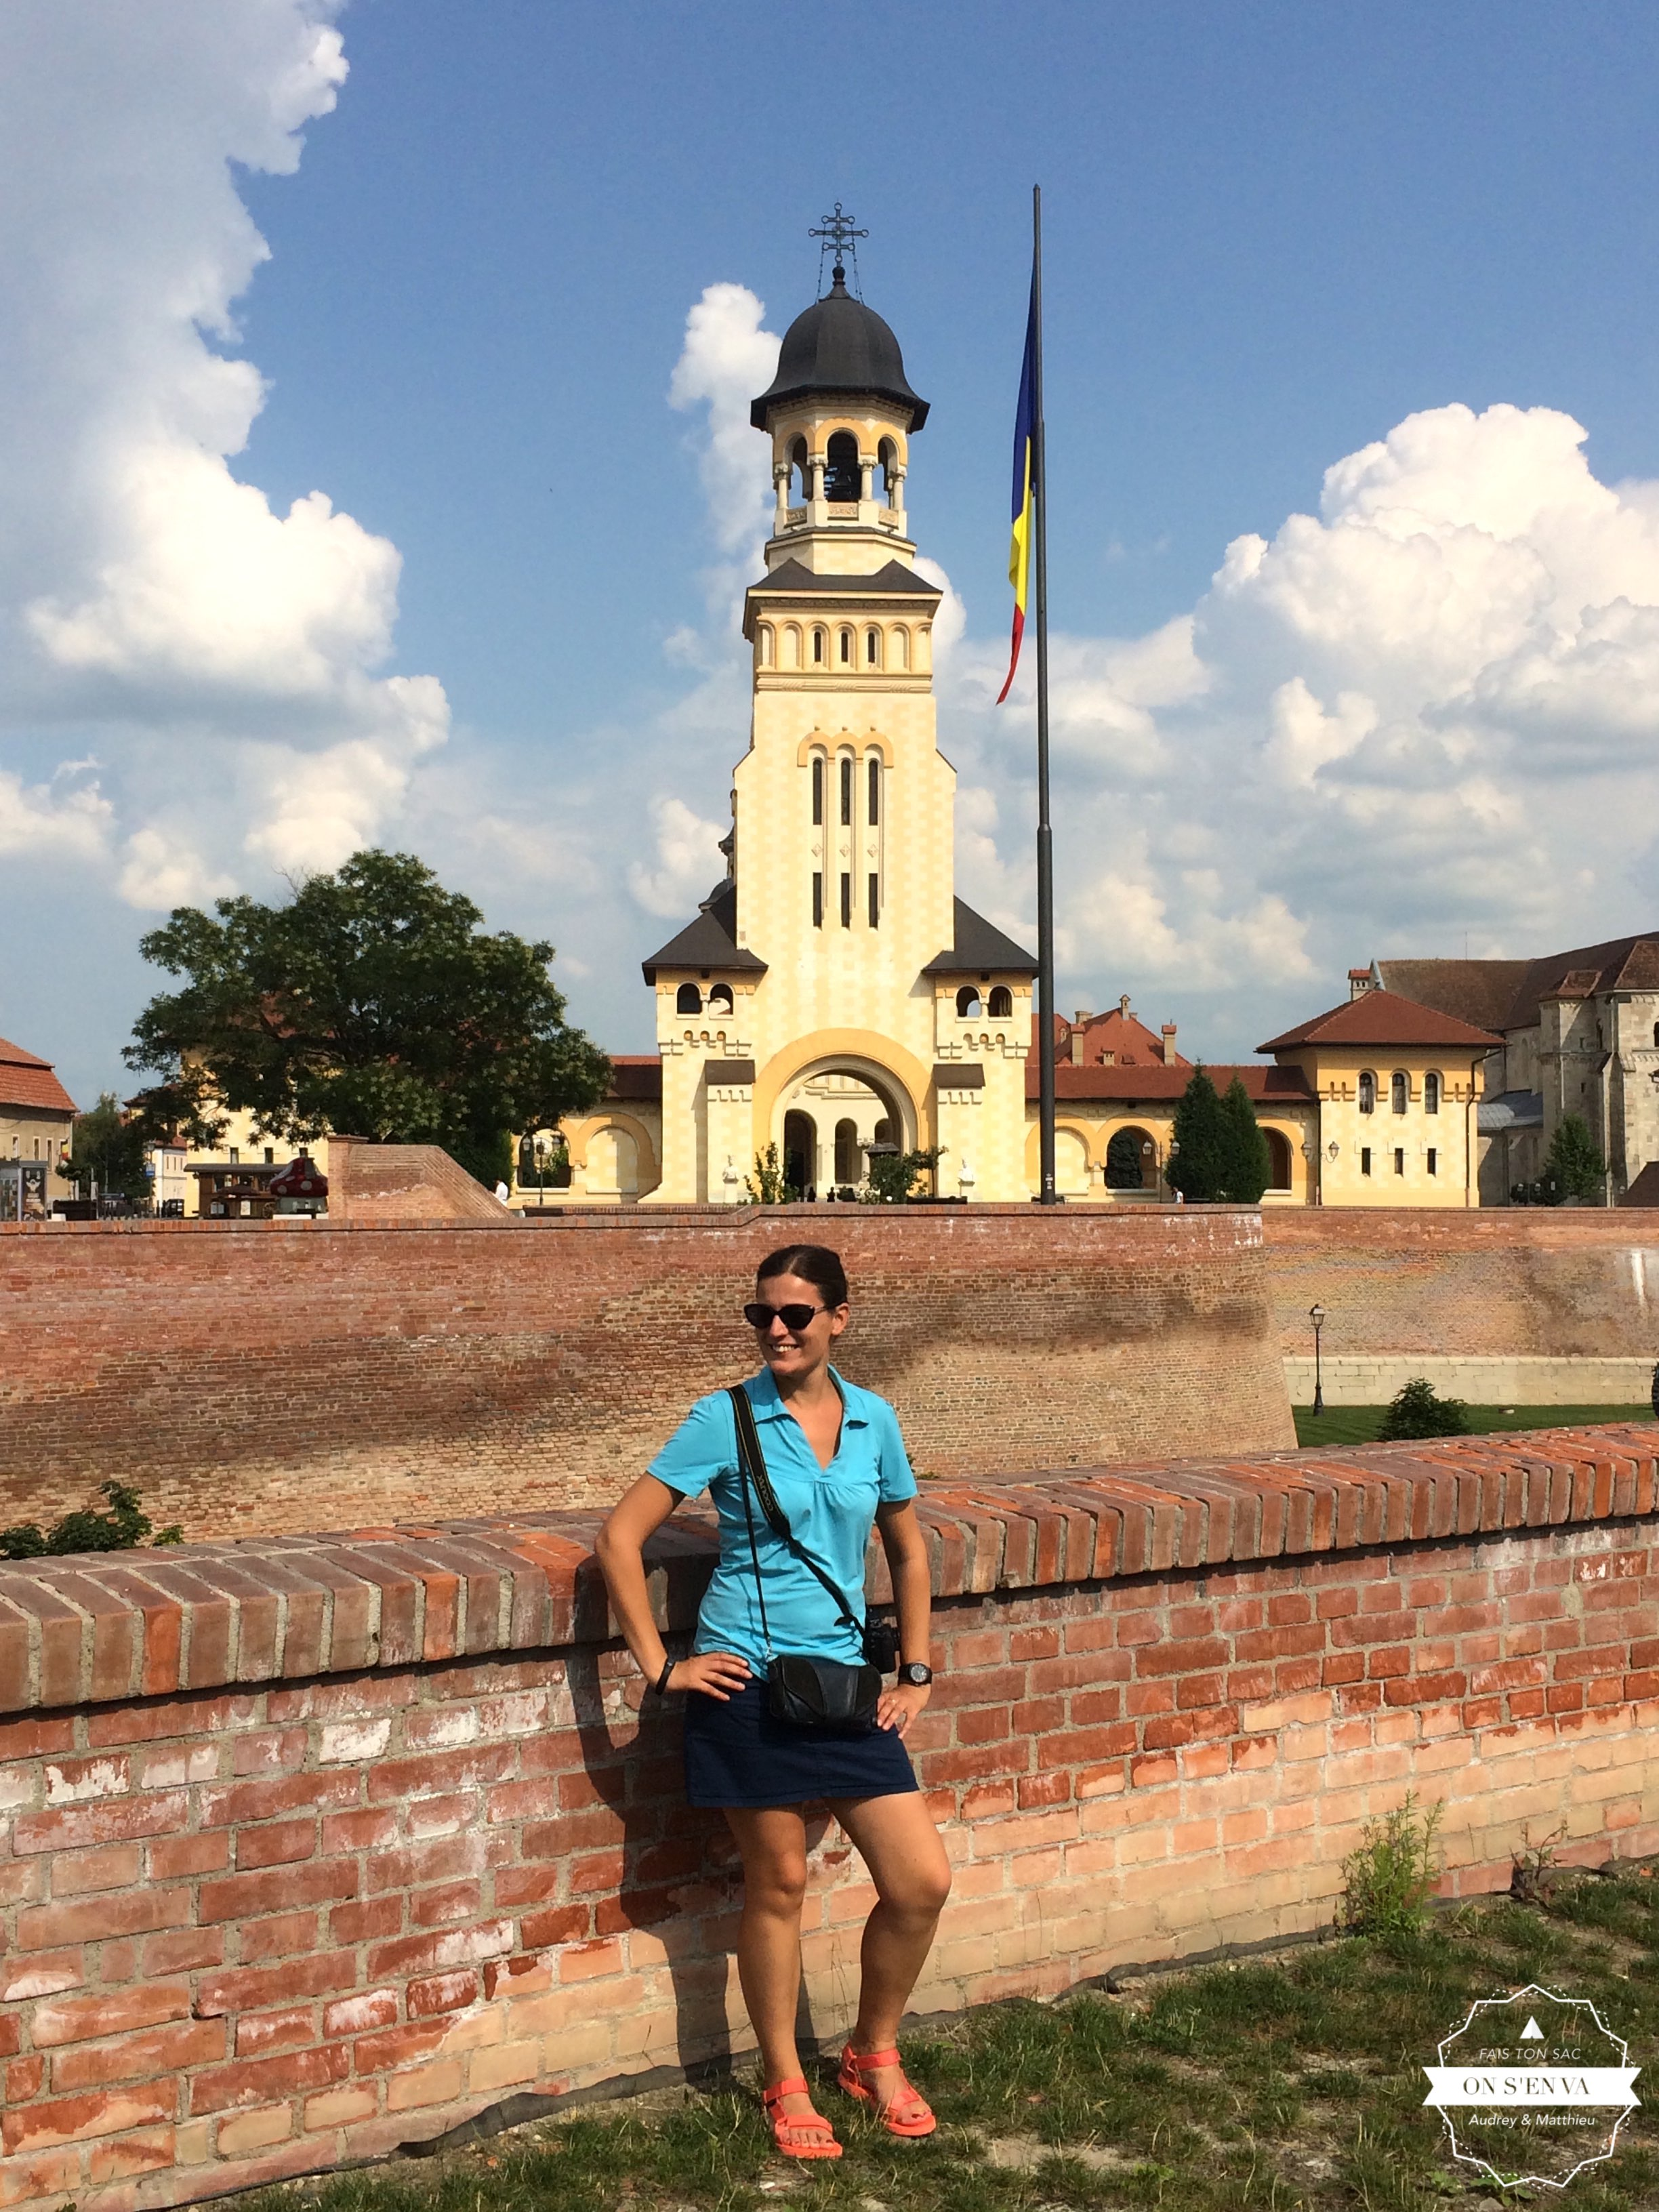 La citadelle d'Alba Iulia